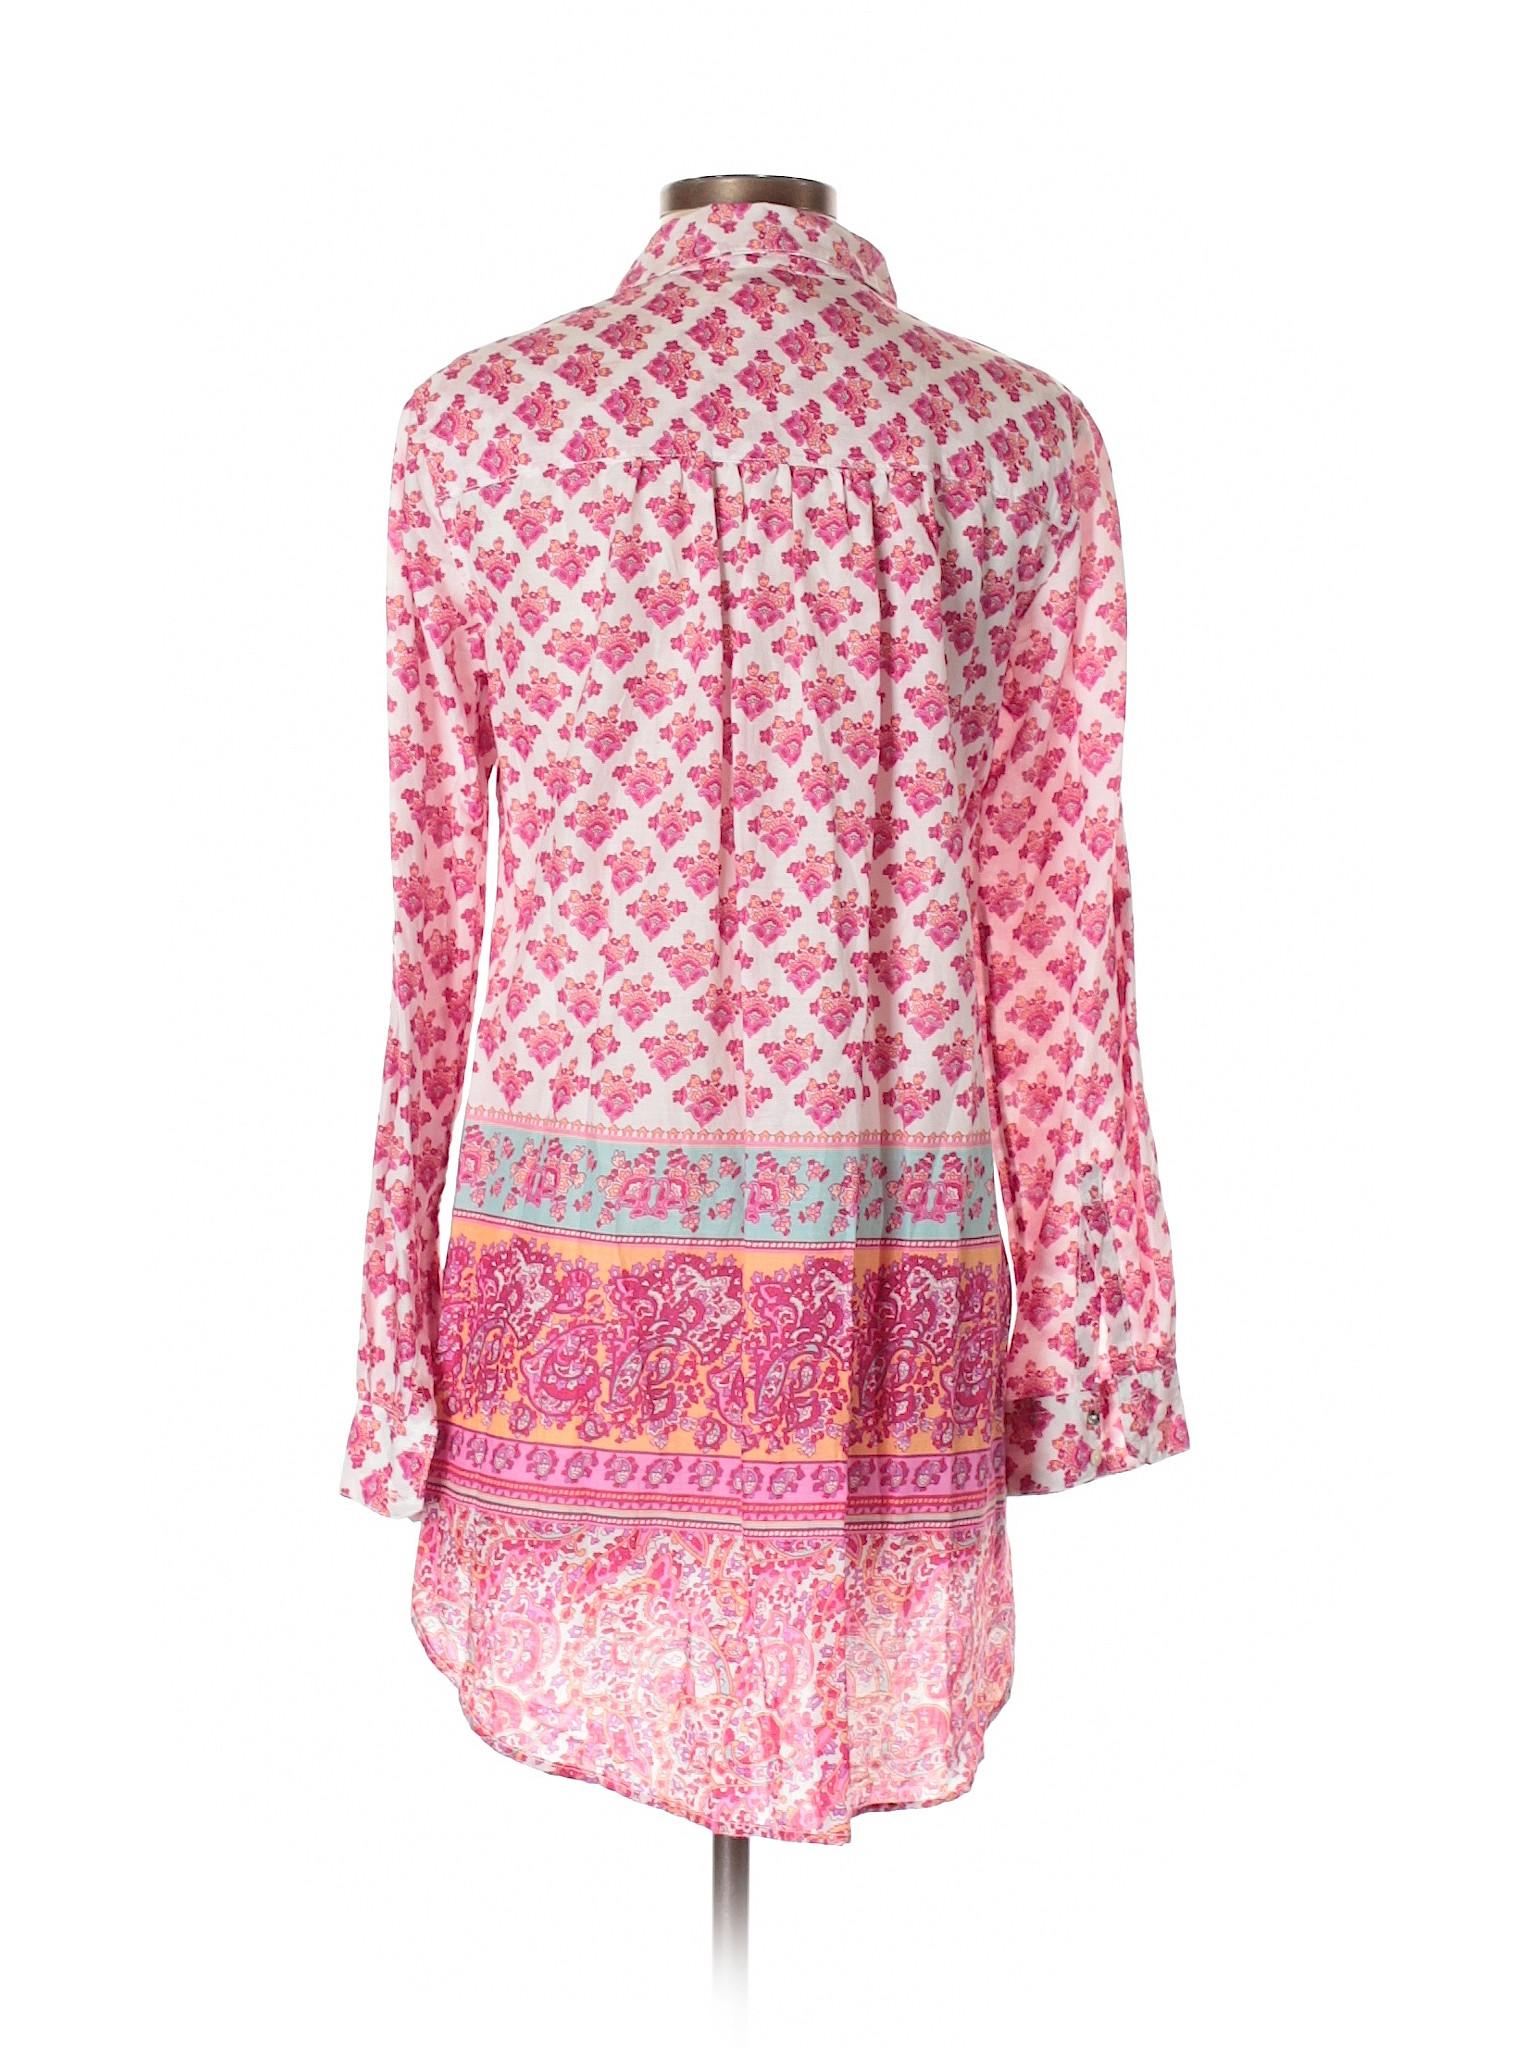 winter G O L Boutique Casual H G amp;M Dress dWOZTc